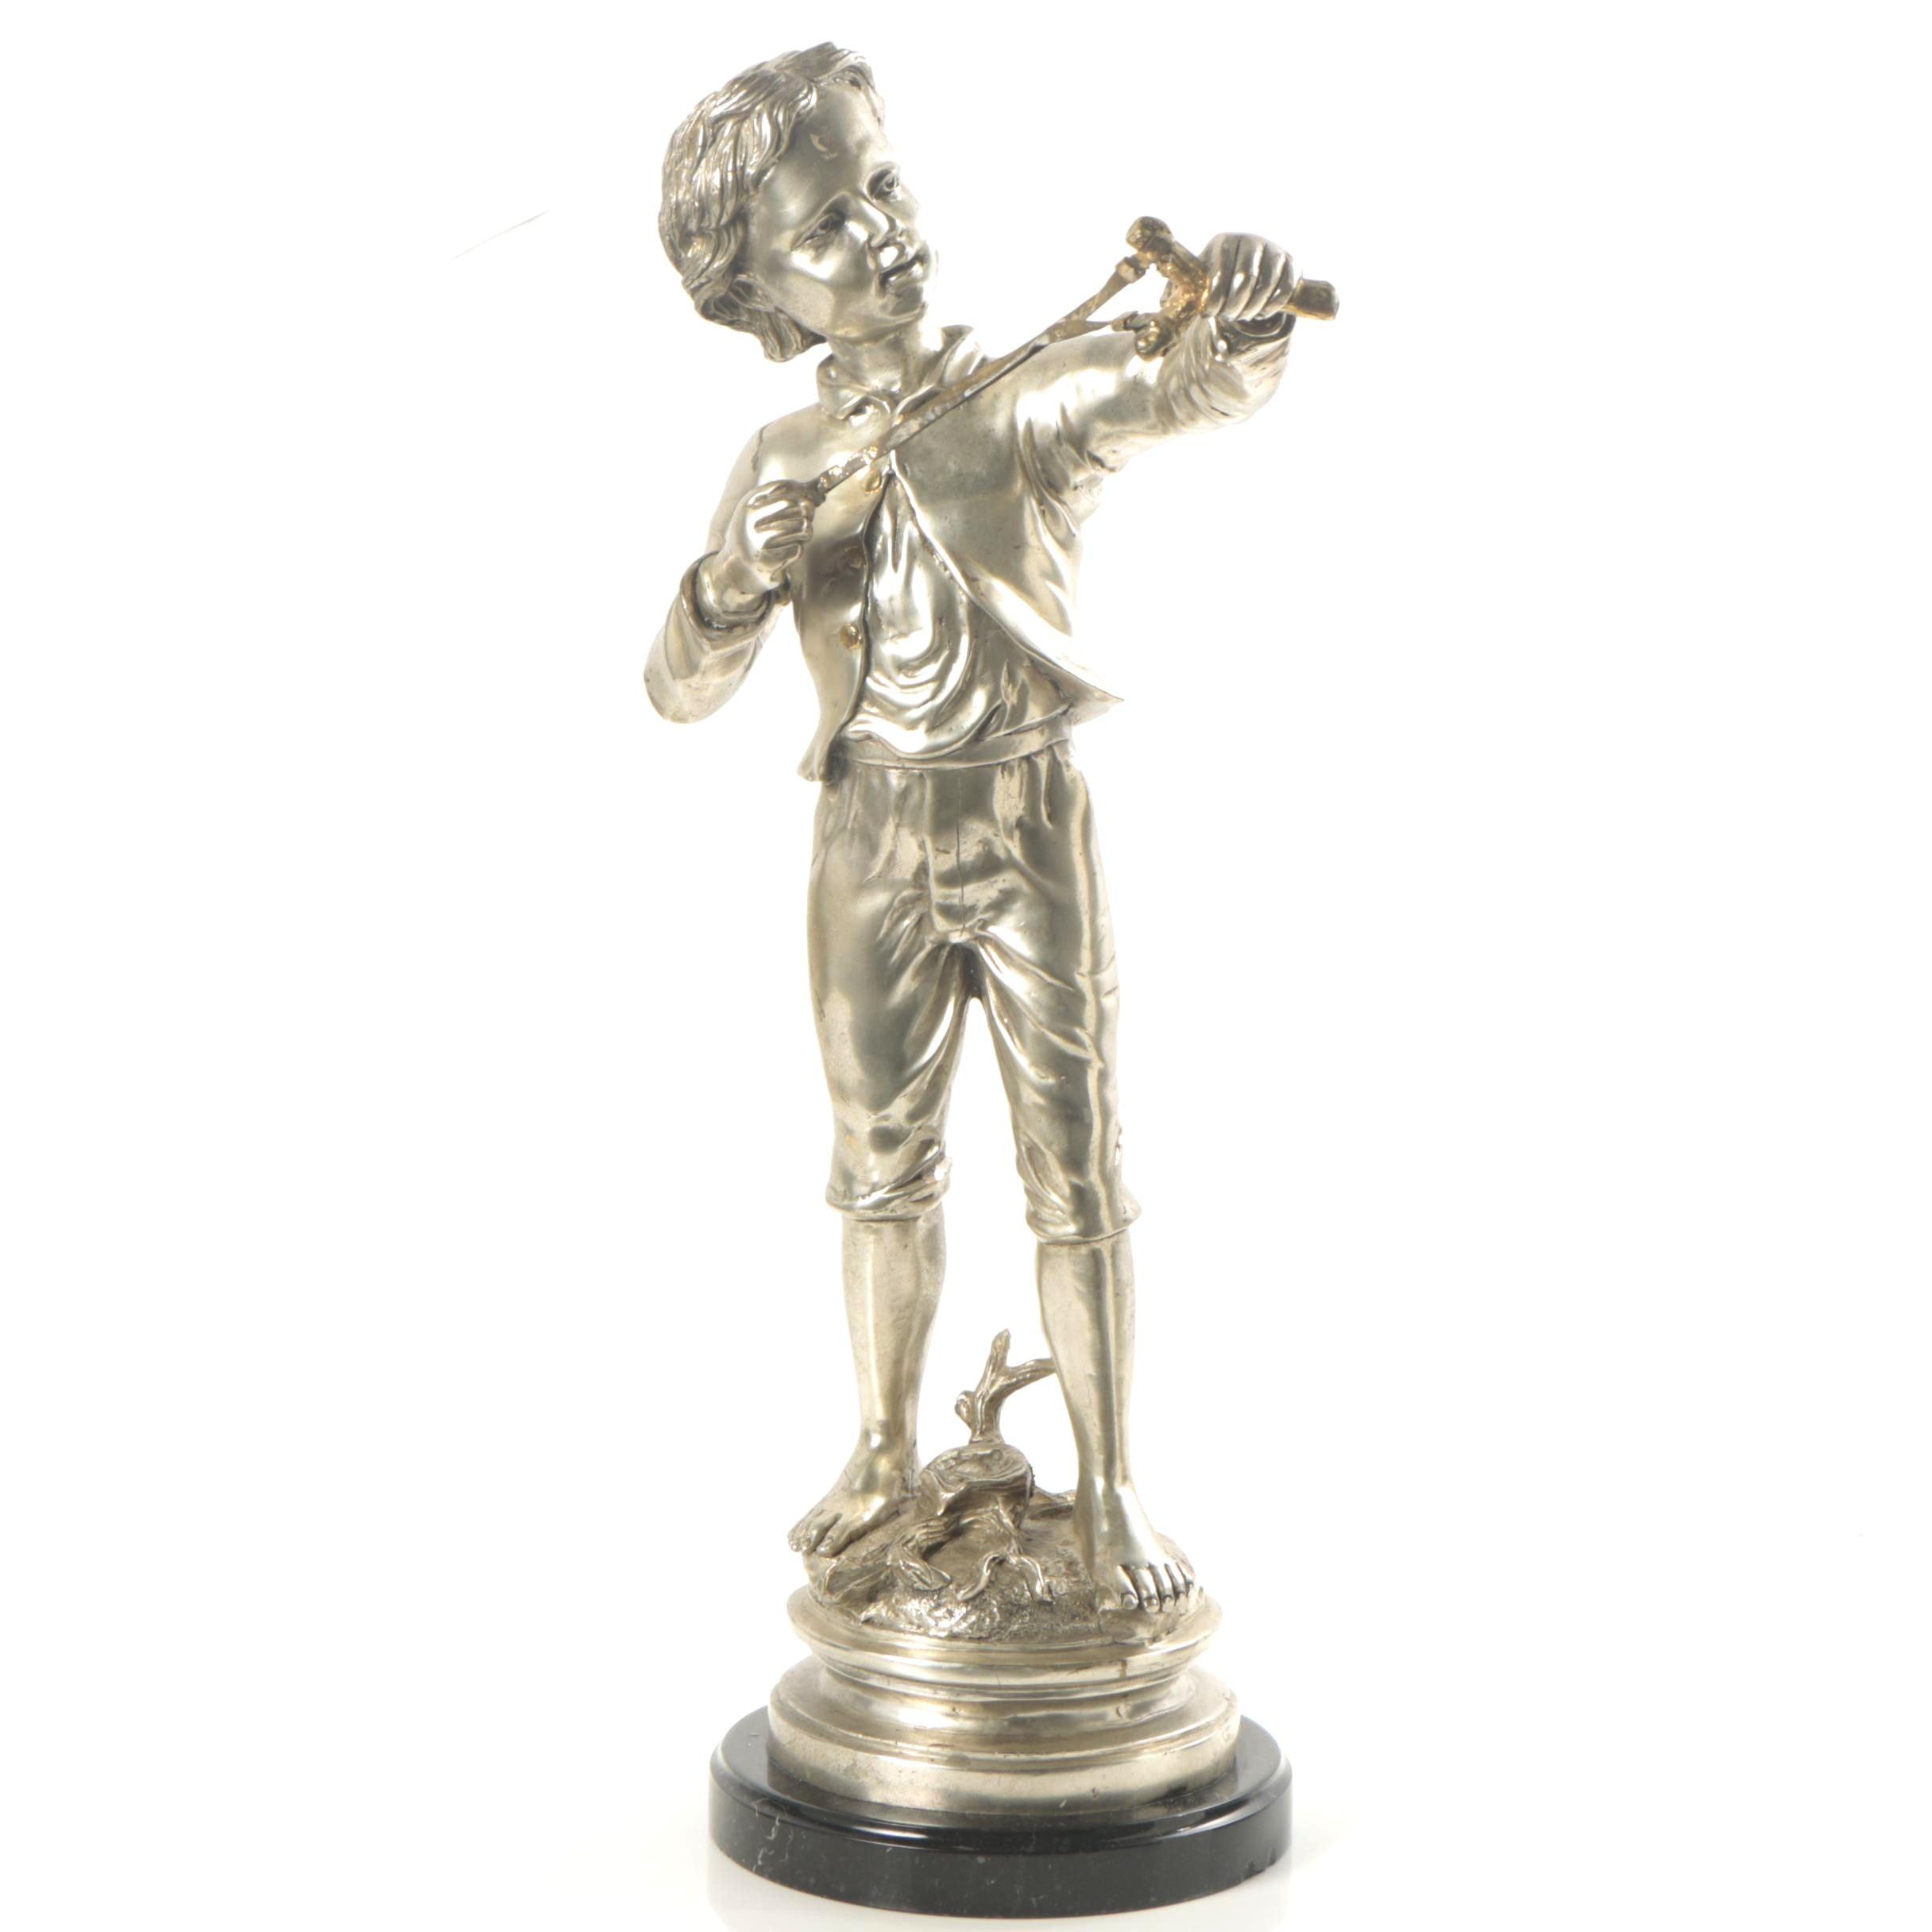 Cast Brass Sculpture of Boy with Slingshot